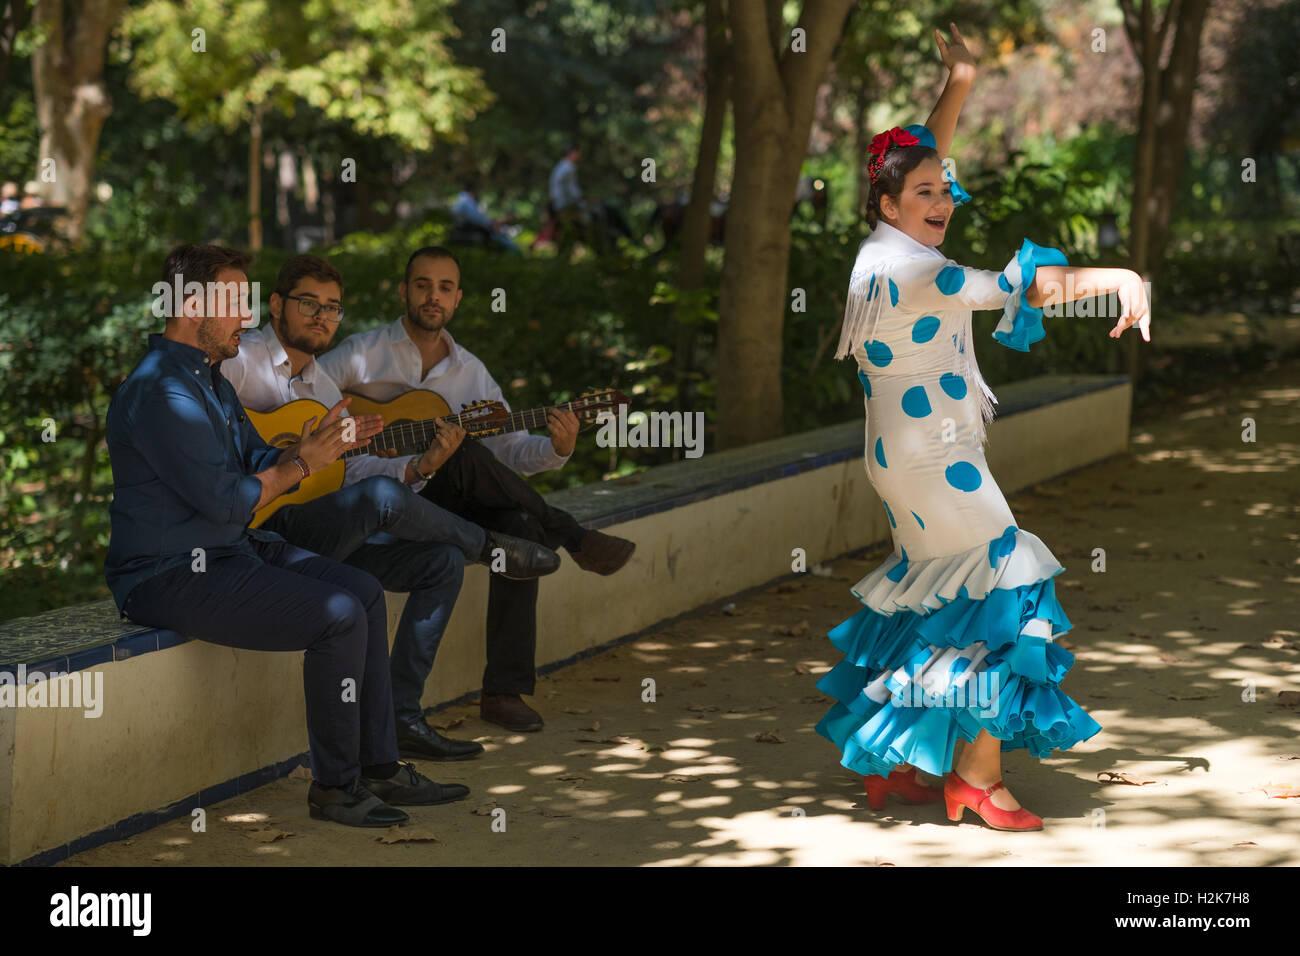 Musicians and flamenco dancer - Stock Image